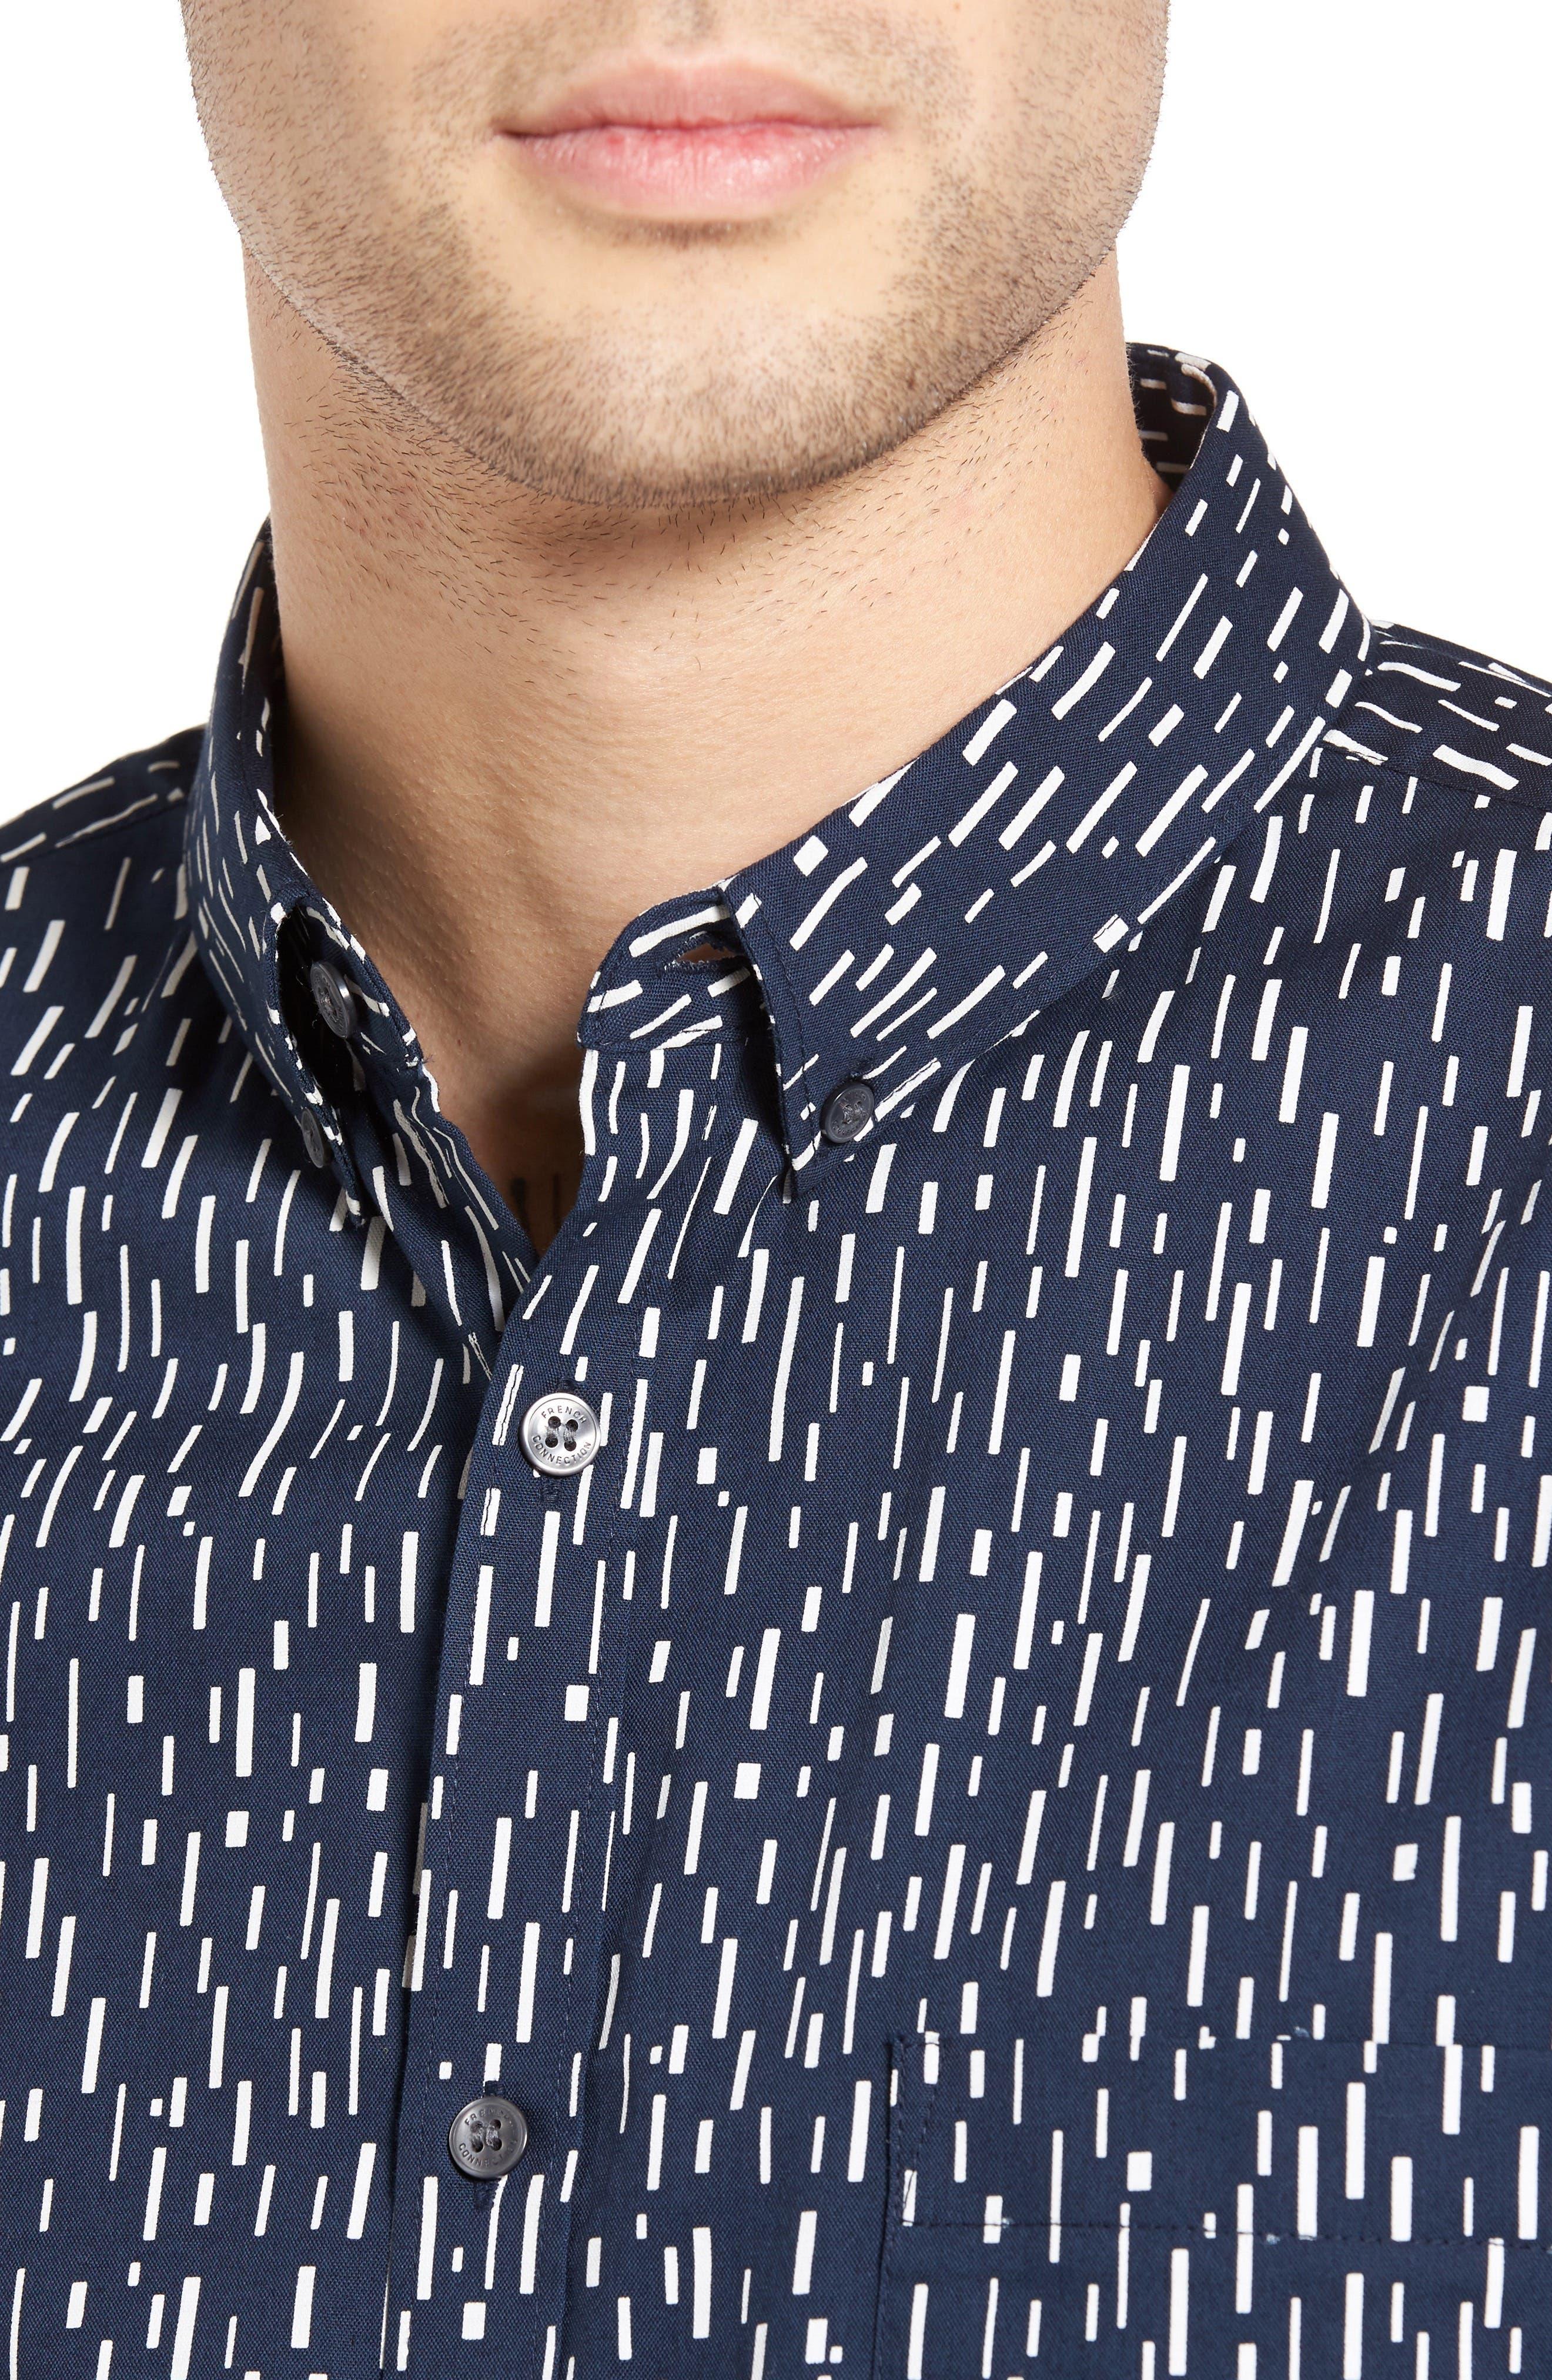 Rain Dash Slim Fit Oxford Shirt,                             Alternate thumbnail 4, color,                             407